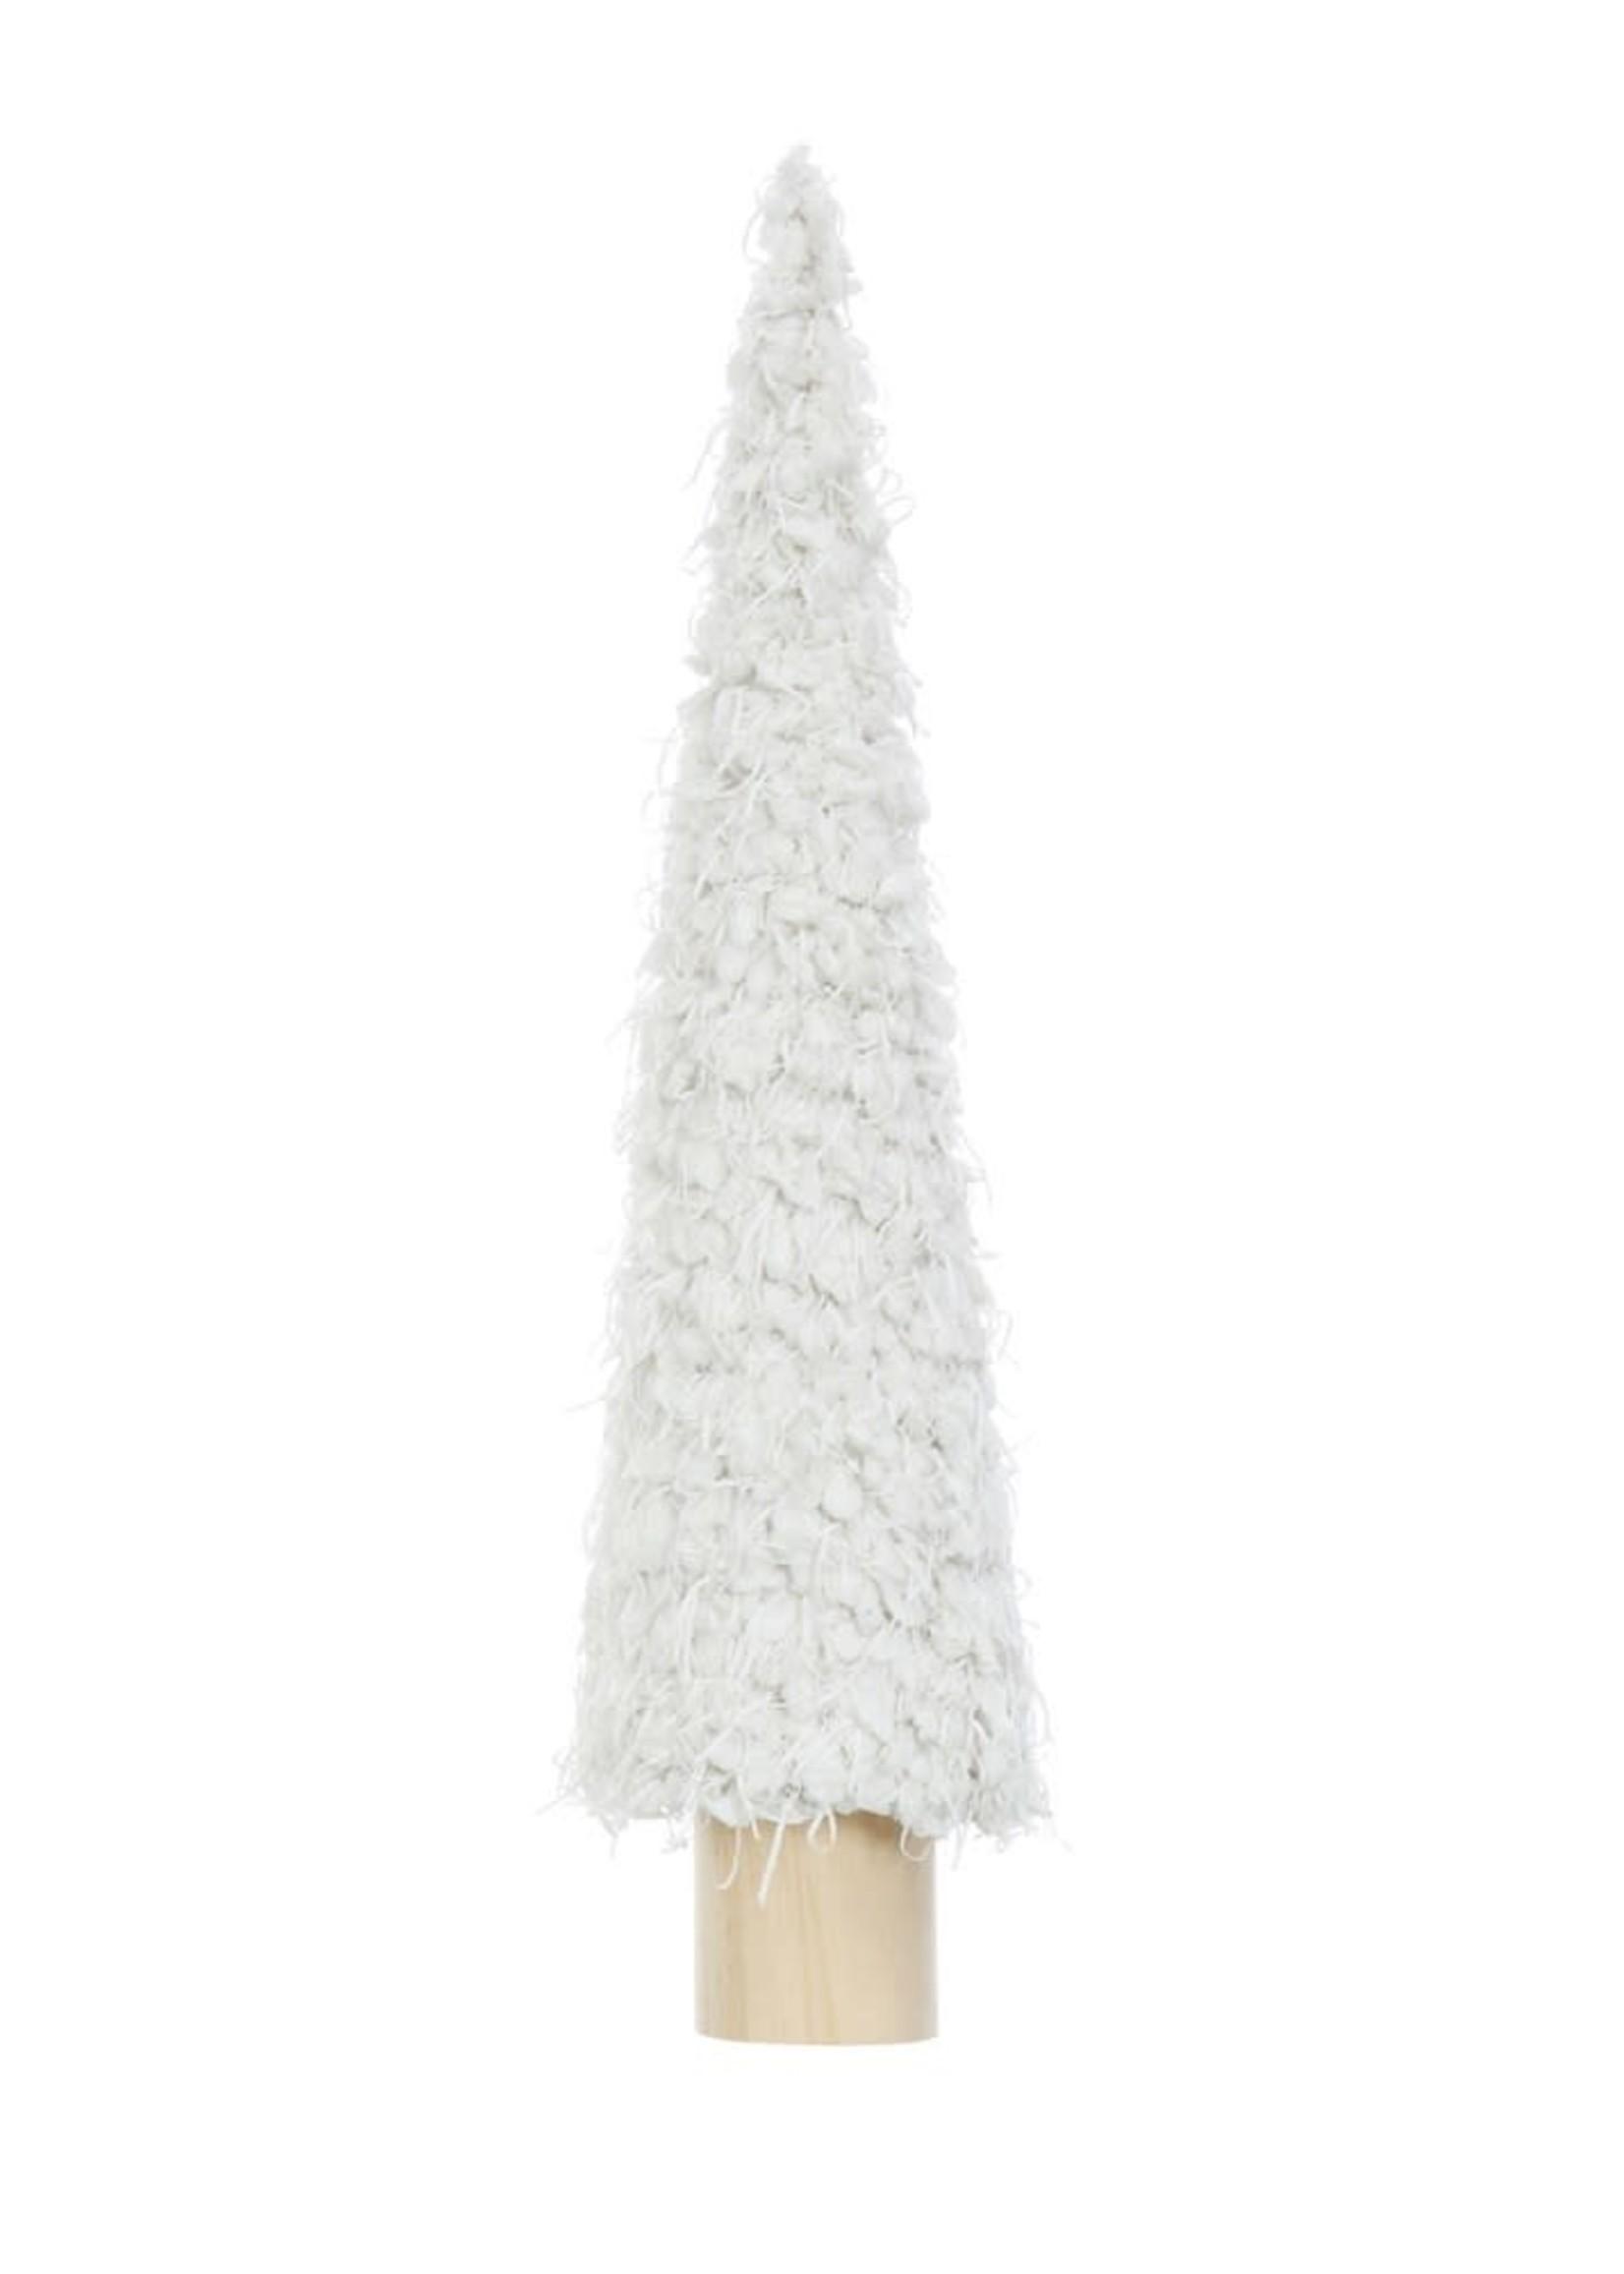 "Creative Co-Op 4-1/4"" Round x 19""H Fabric Cone Tree on Wood Base, Cream"